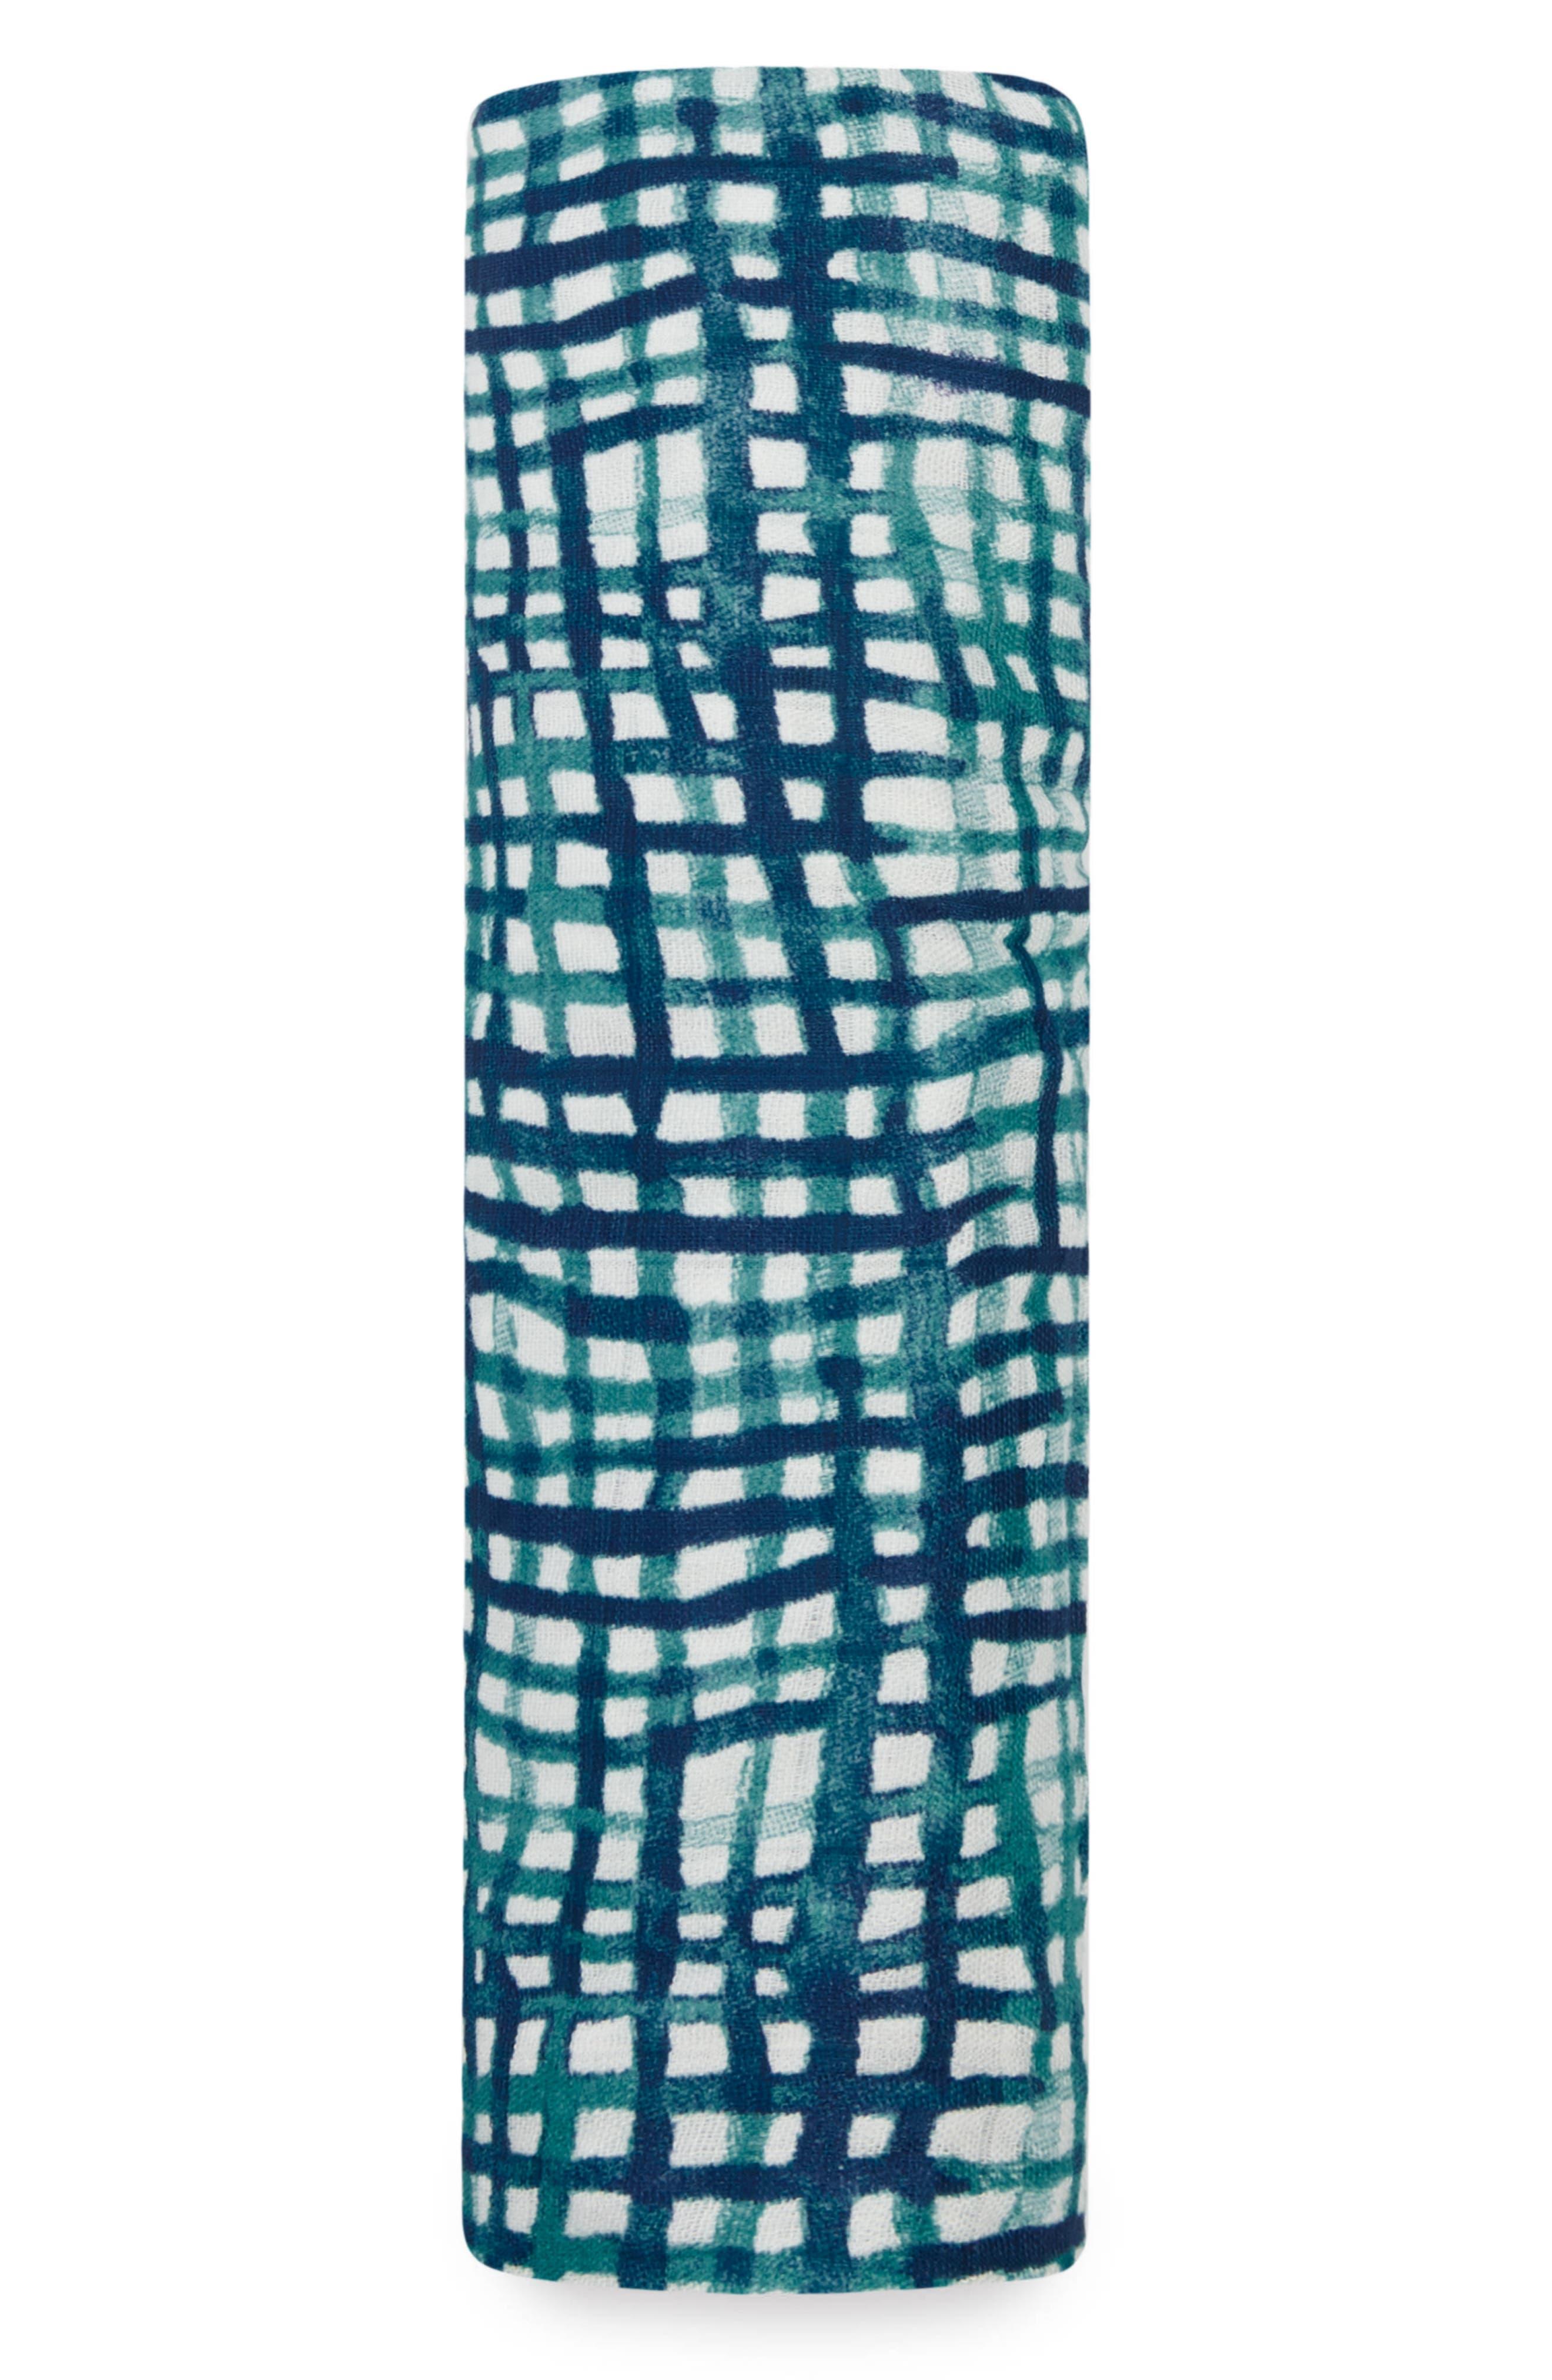 Silky Soft Swaddling Cloth,                             Main thumbnail 1, color,                             SEAPORT